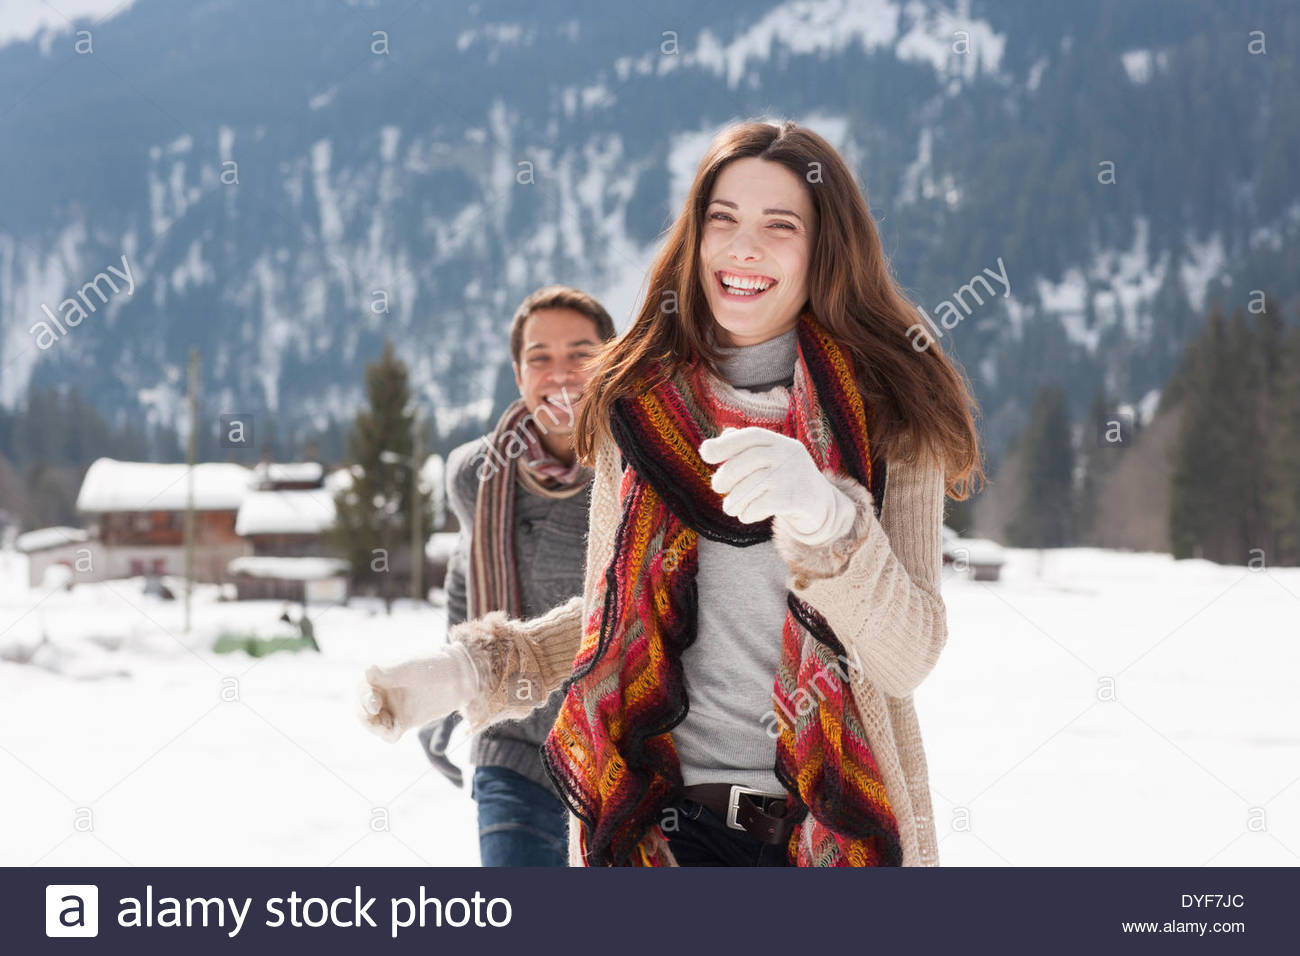 Par ejecutar afuera en la nieve Imagen De Stock